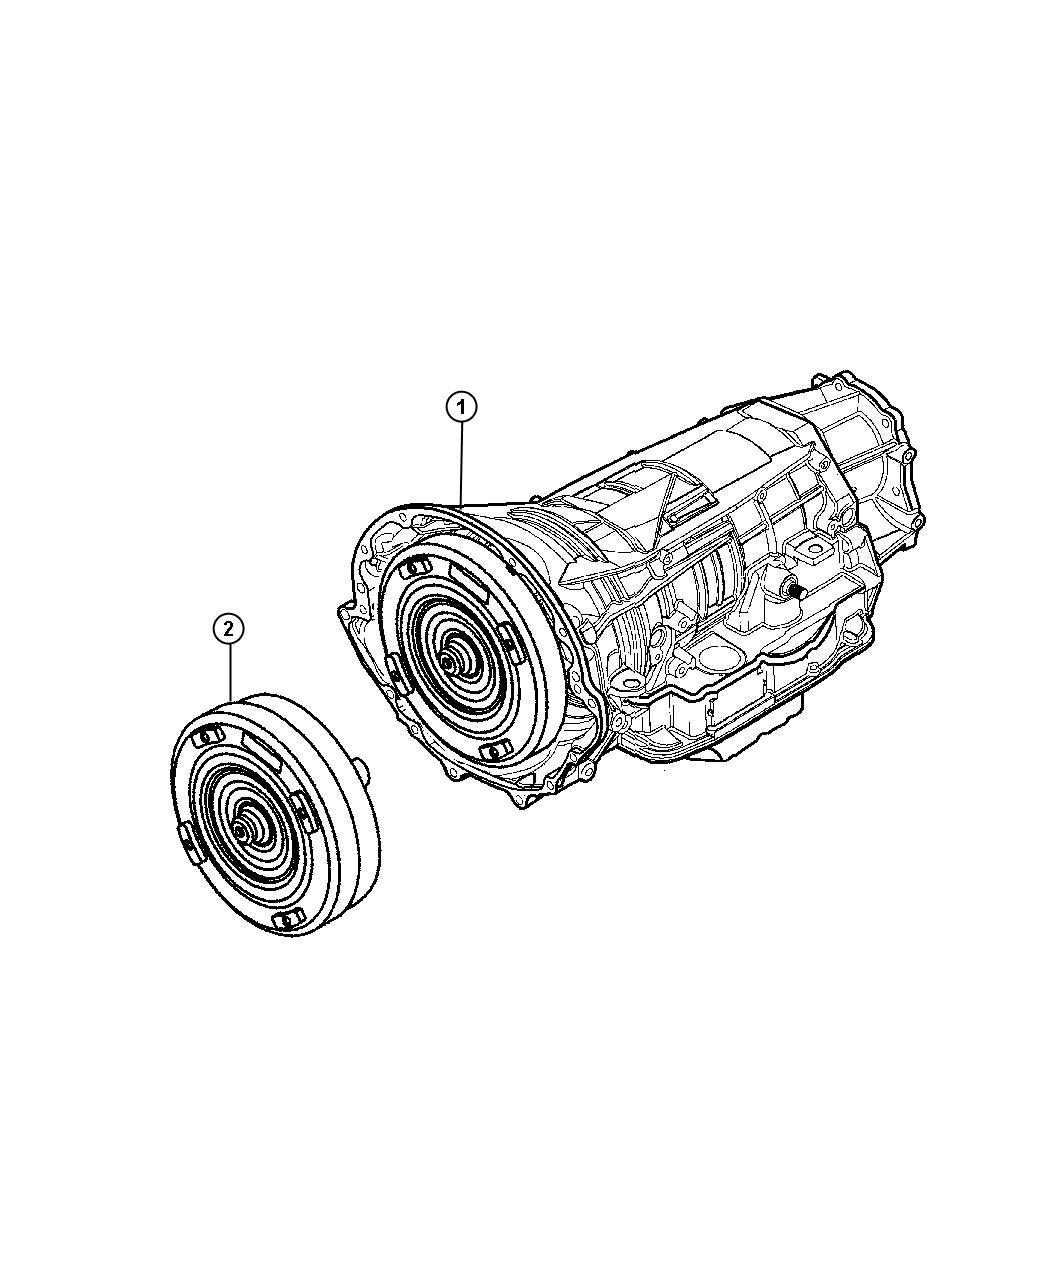 Dodge Dakota Transmission package. With torque converter